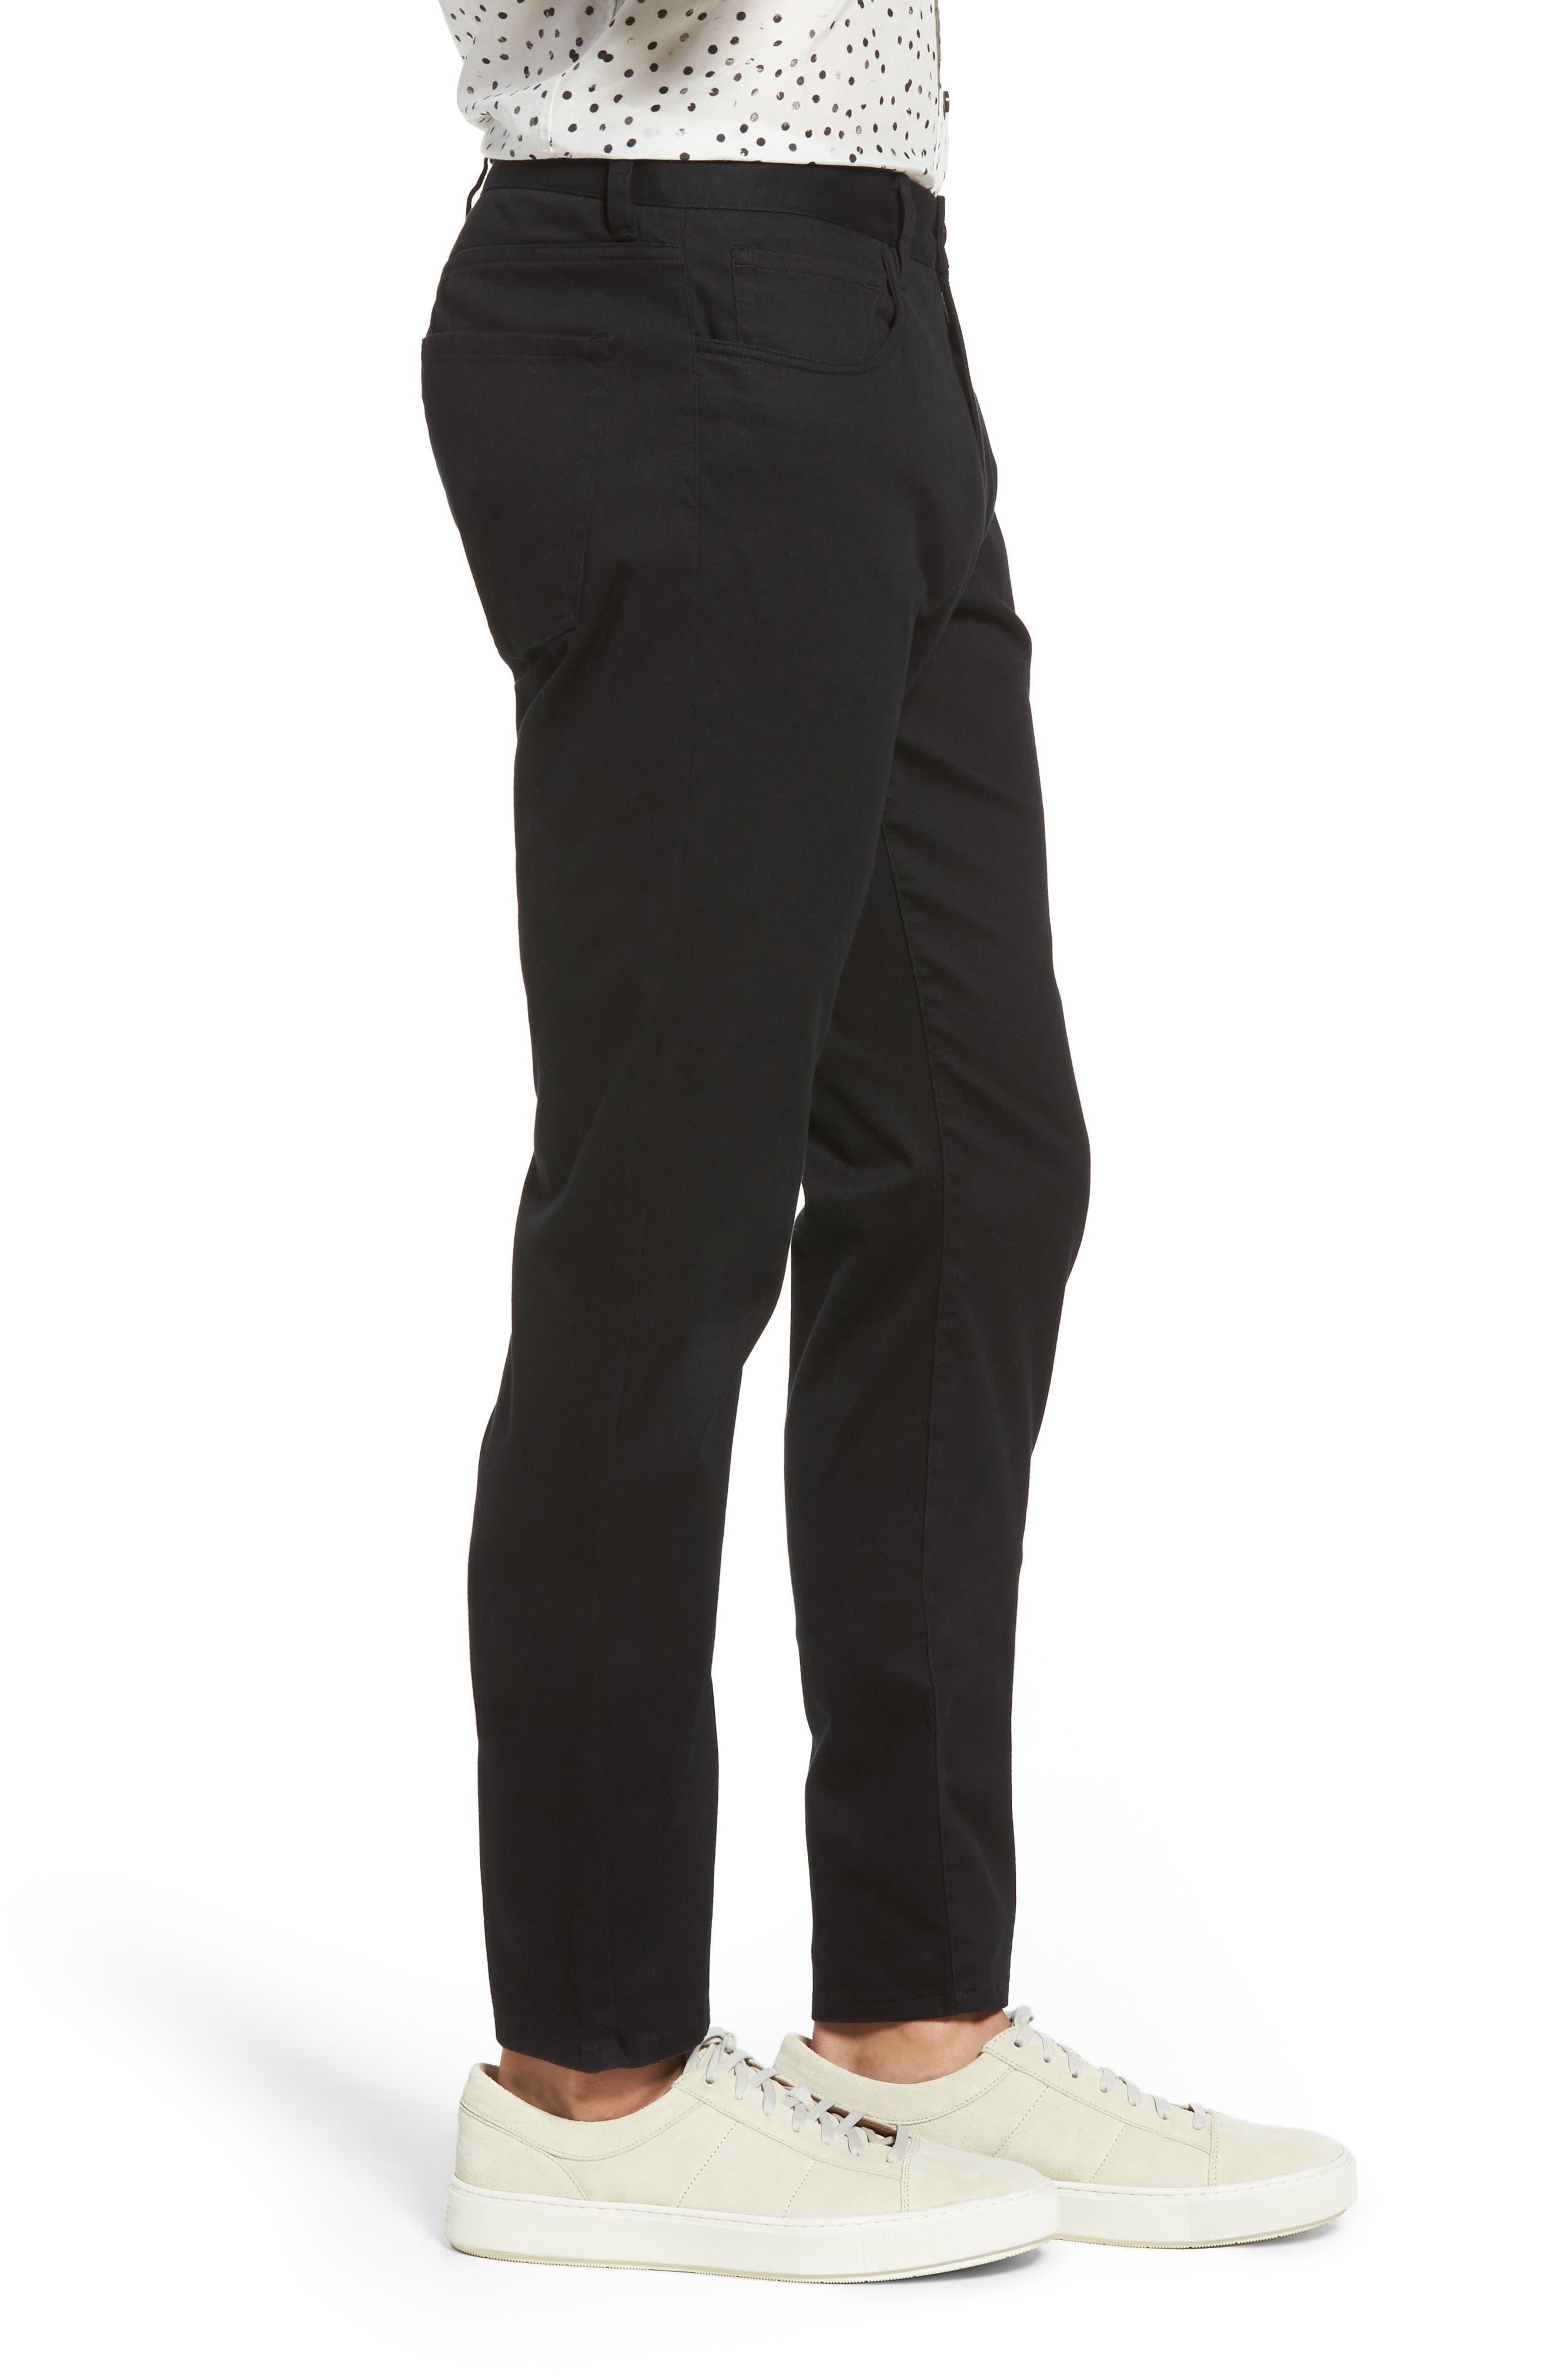 VINCE,                             Soho Slim Fit Five-Pocket Pants,                             Alternate thumbnail 3, color,                             001